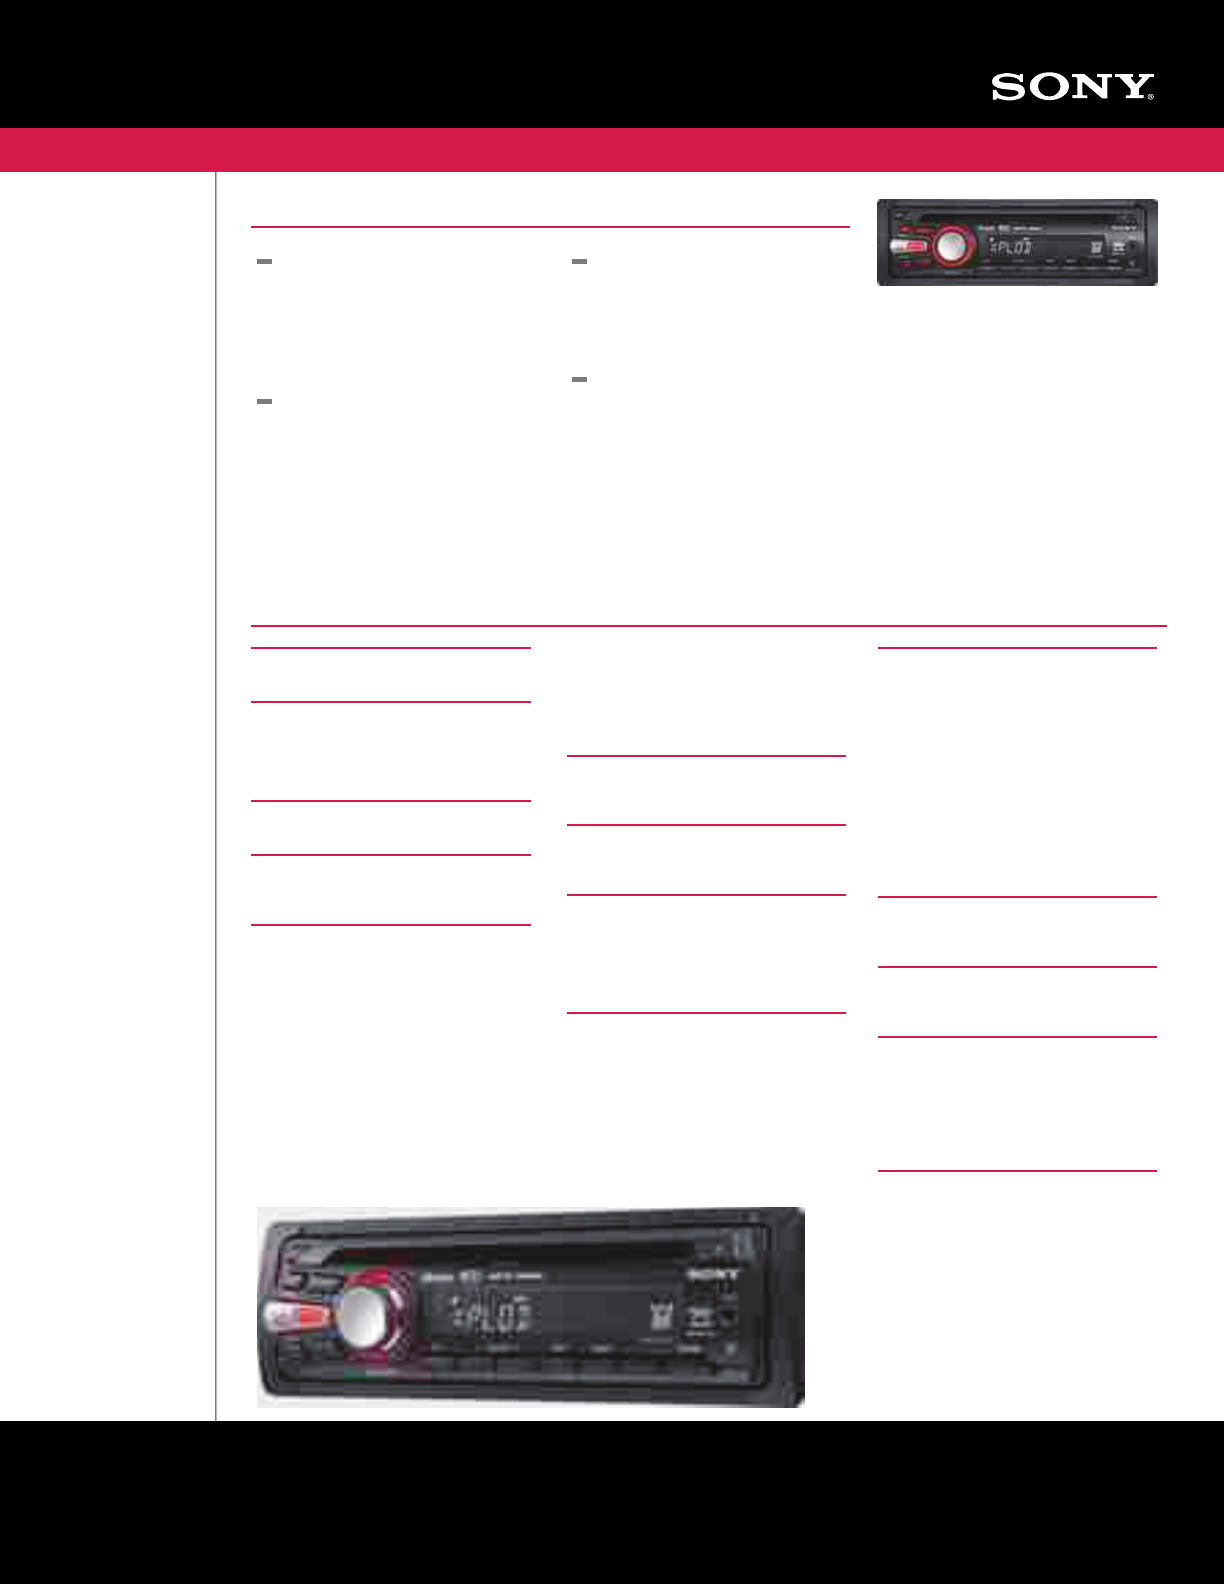 sony cd player wiring diagram sony cdx gt330 wiring diagram colors general wiring diagrams  sony cdx gt330 wiring diagram colors